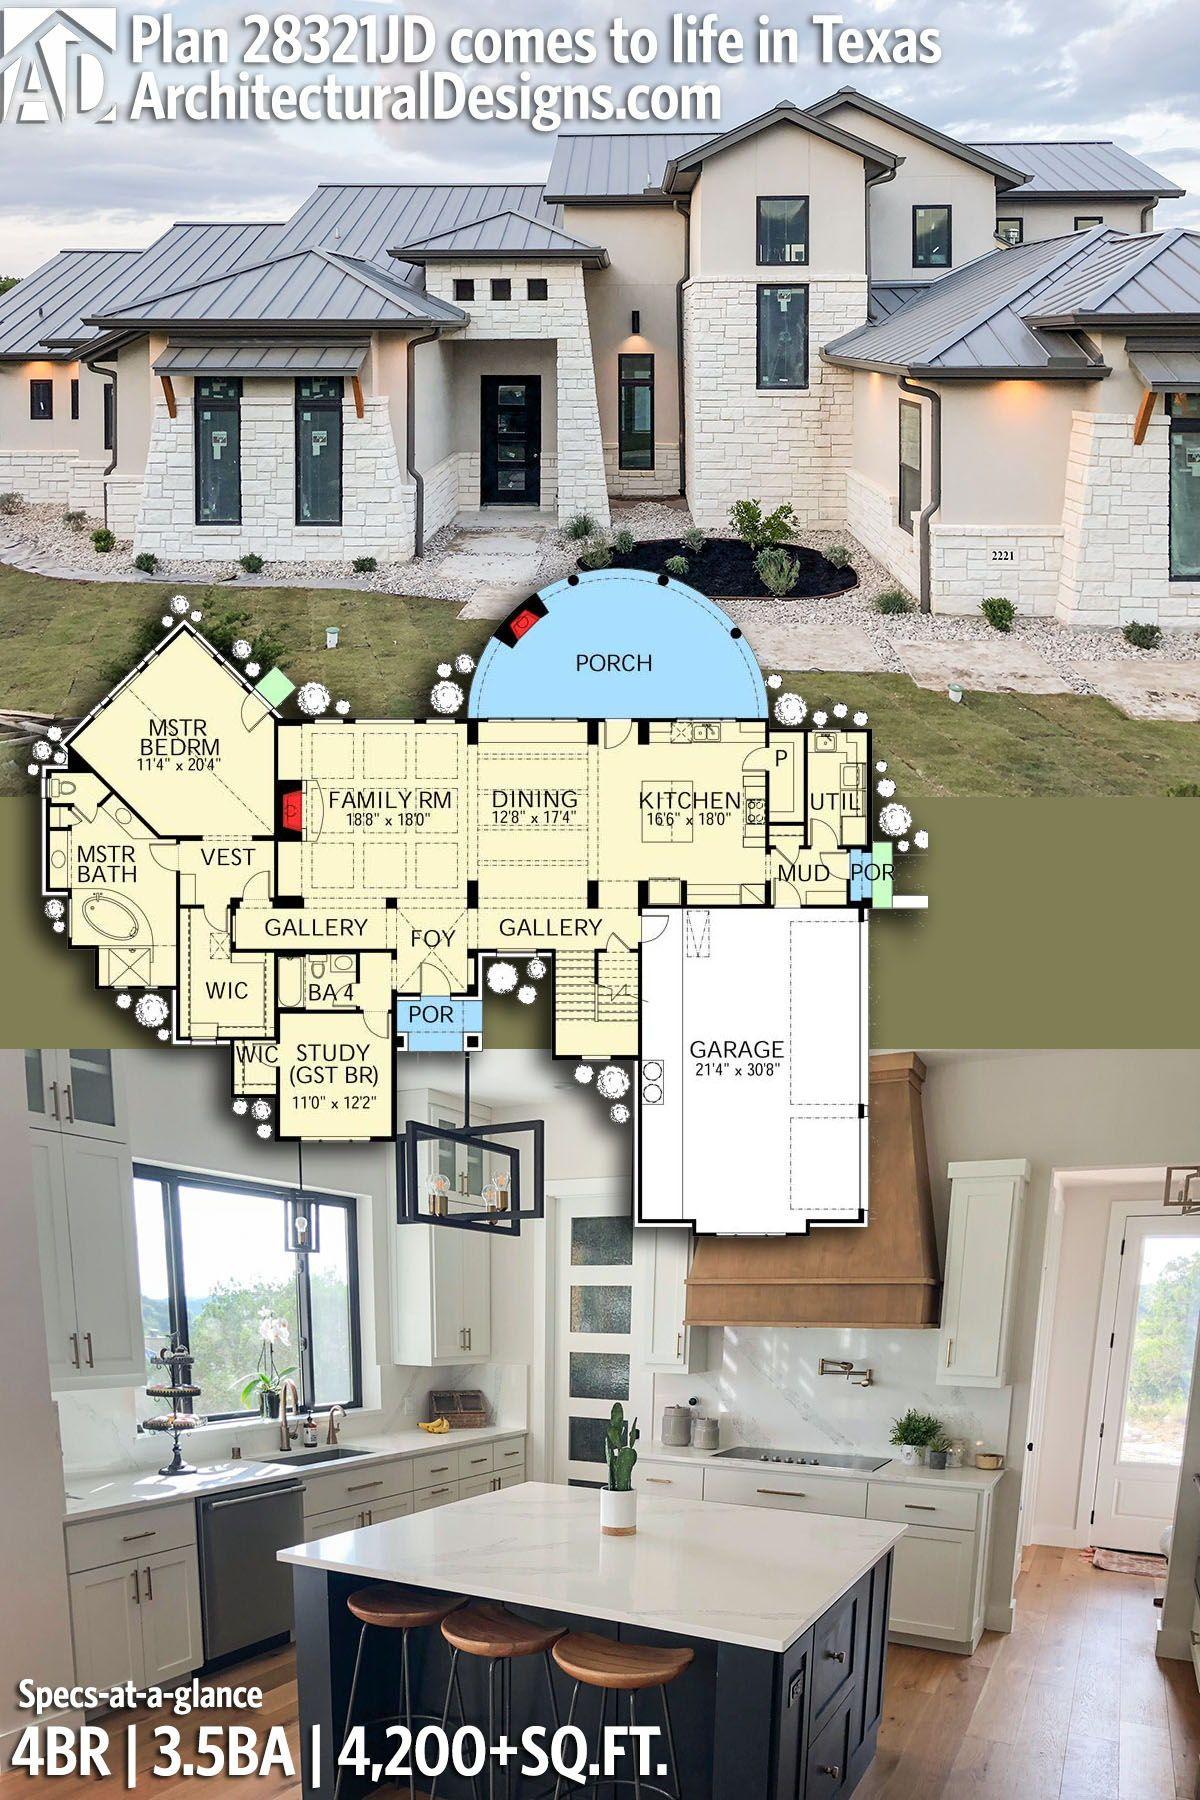 Architectural Designs House Plan 28321hj Client Built In Texas 3 4br 4ba 3 000 Sq Ft Ready Whe Plan Zagorodnogo Doma Arhitekturnyj Dizajn Dom Simsov